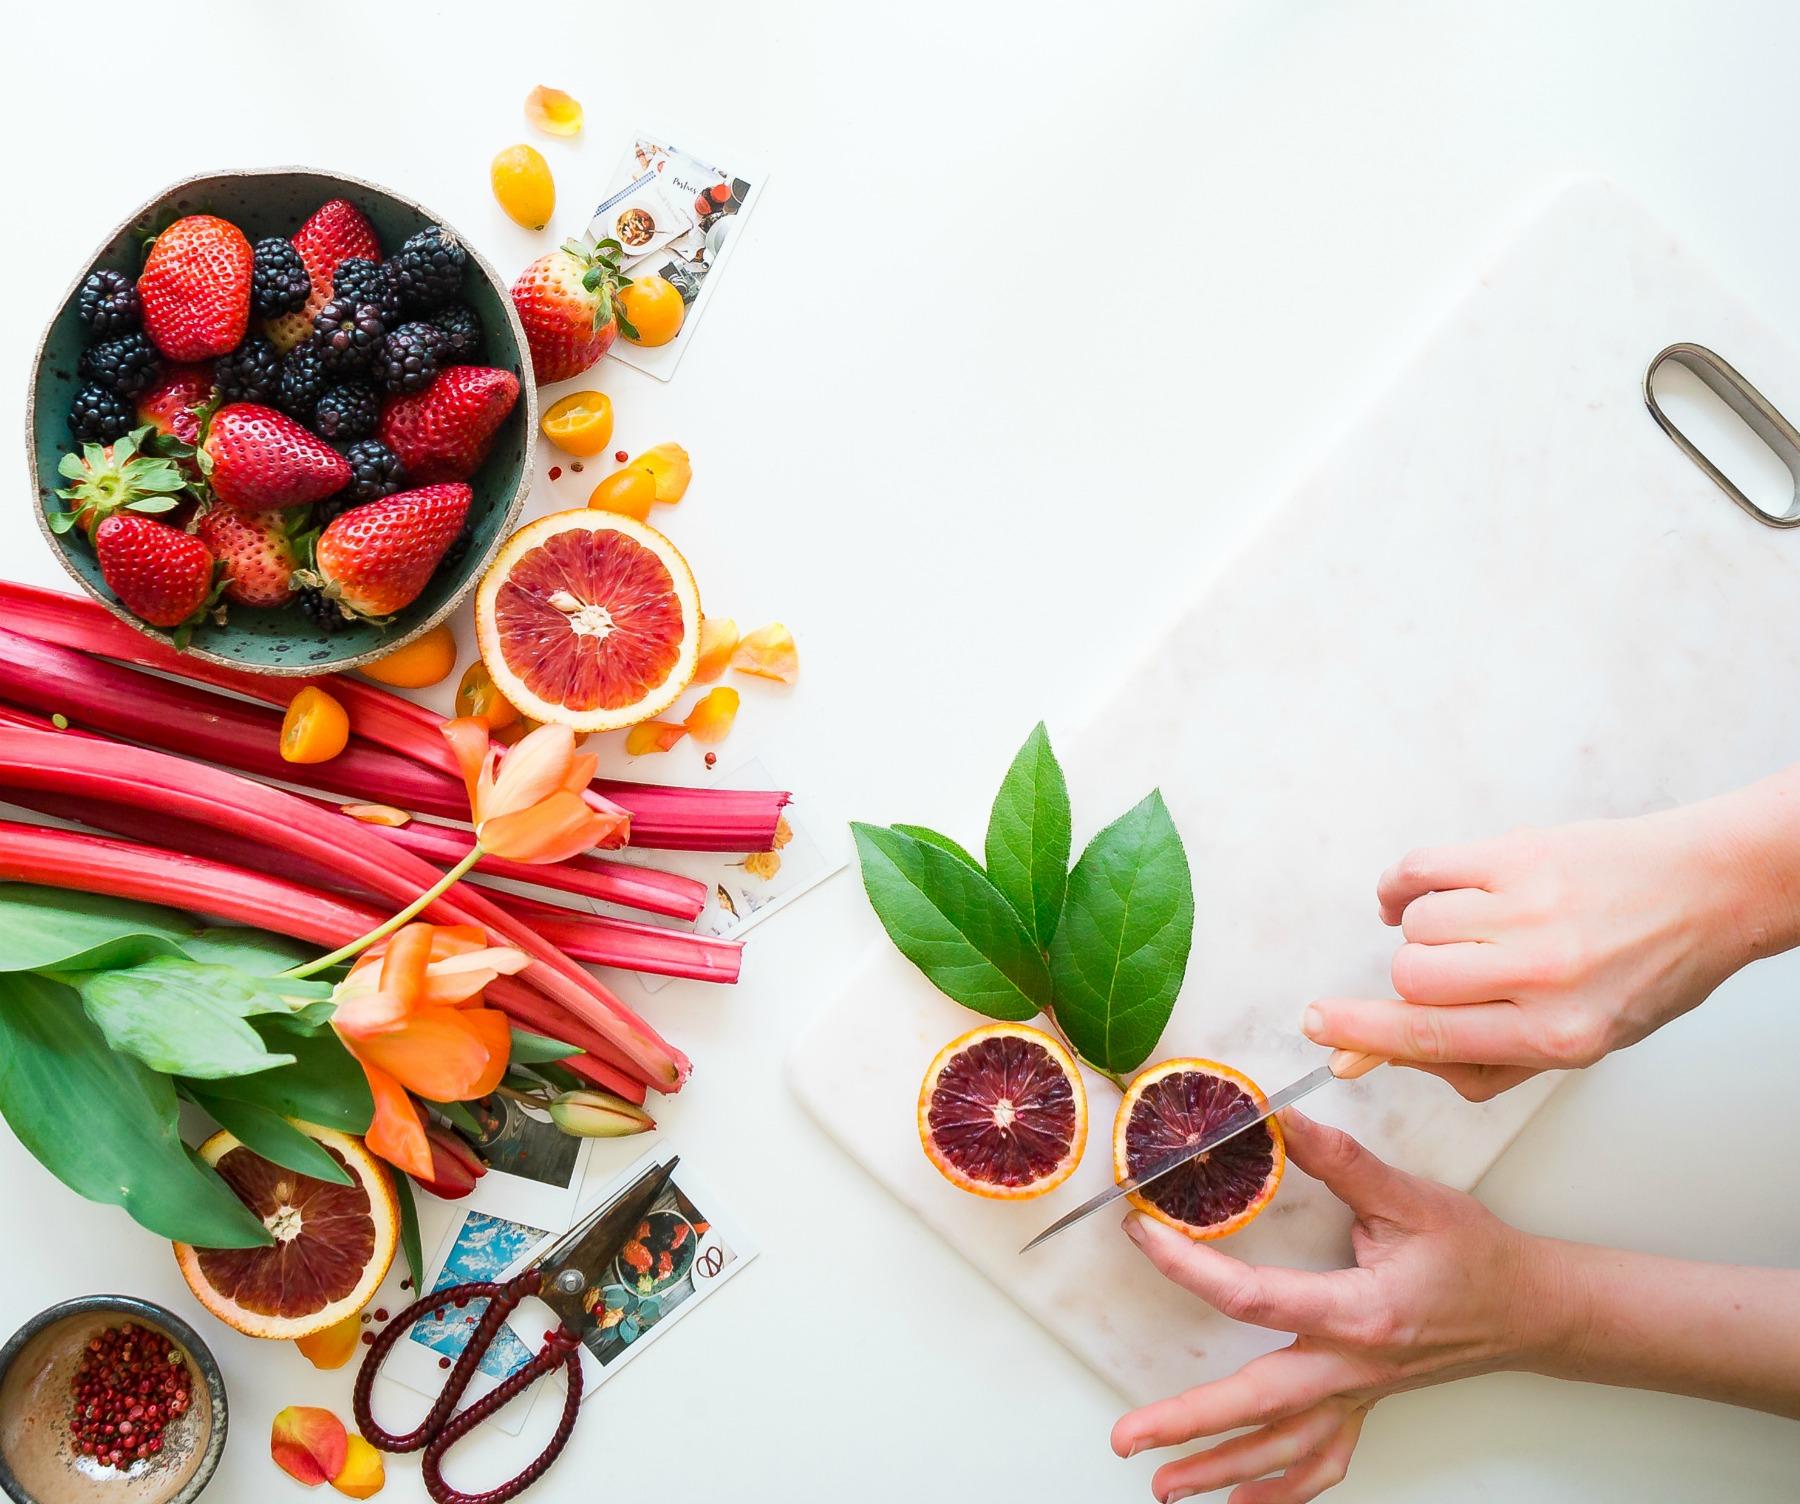 2017-03 Spring Fruits 2 (1 of 1) (1).jpg